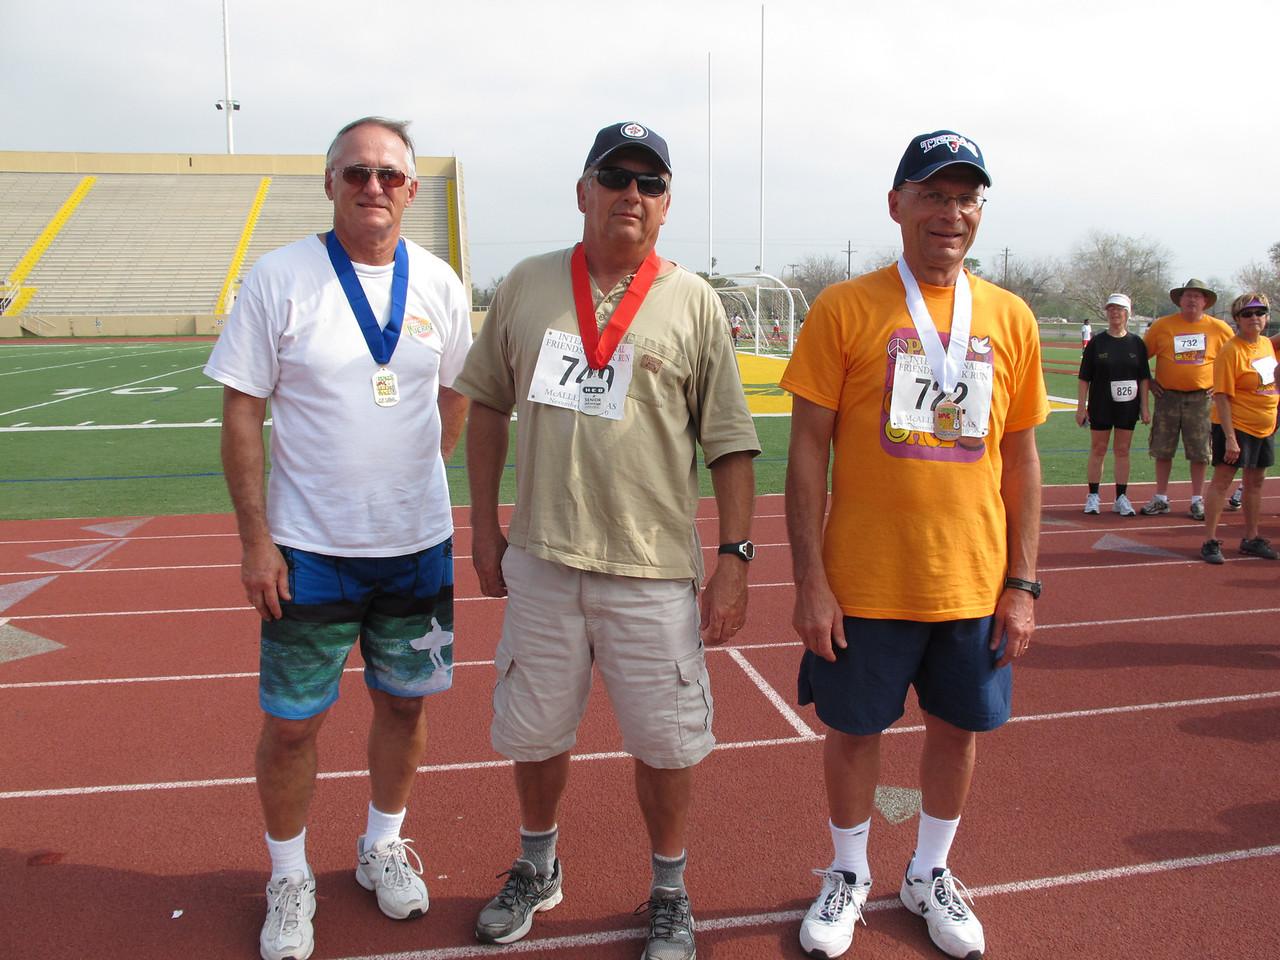 Racewalk Men 60-64 (L-R) 1st Place - Larry Konya (Leisure World), 2nd Place - Richard Glassock (Paradise Park), 3rd Place - Harold Billan (Texas Trails)